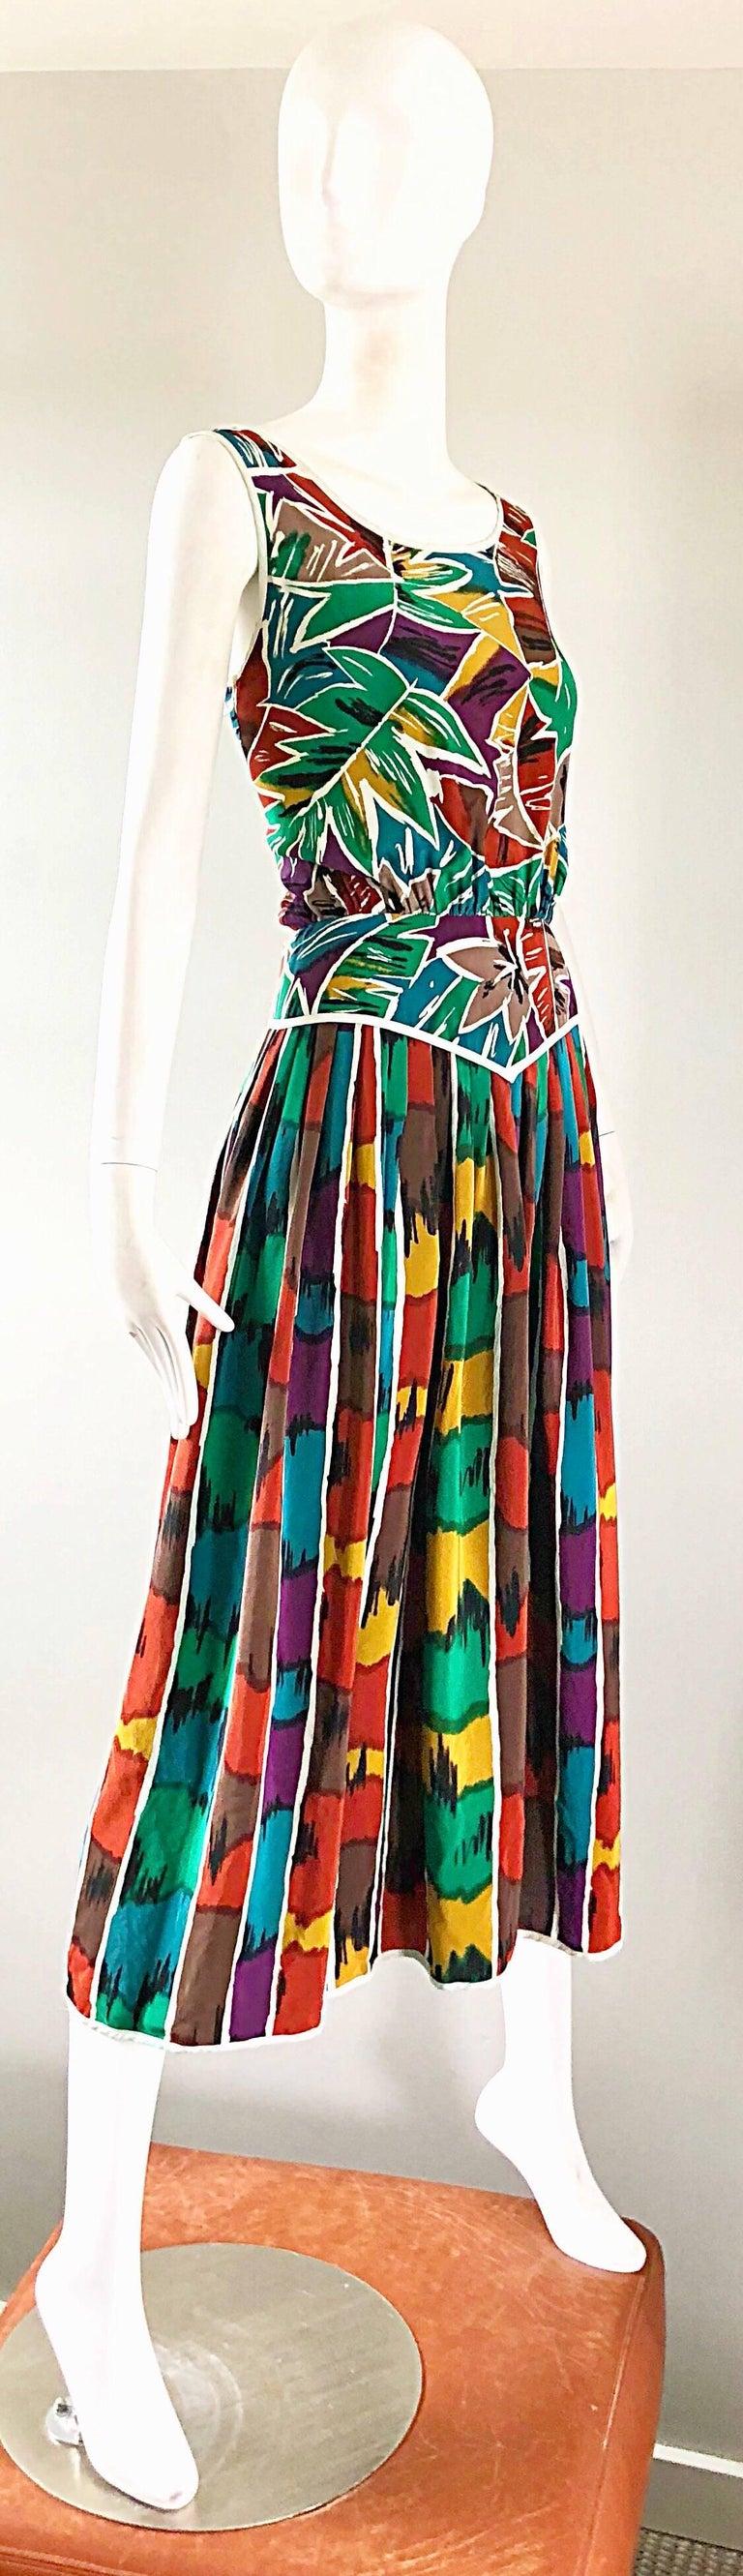 Vintage Oscar de la Renta Size 8 / 10 Kaleidoscope Print Silk Sleeveless Dress For Sale 2